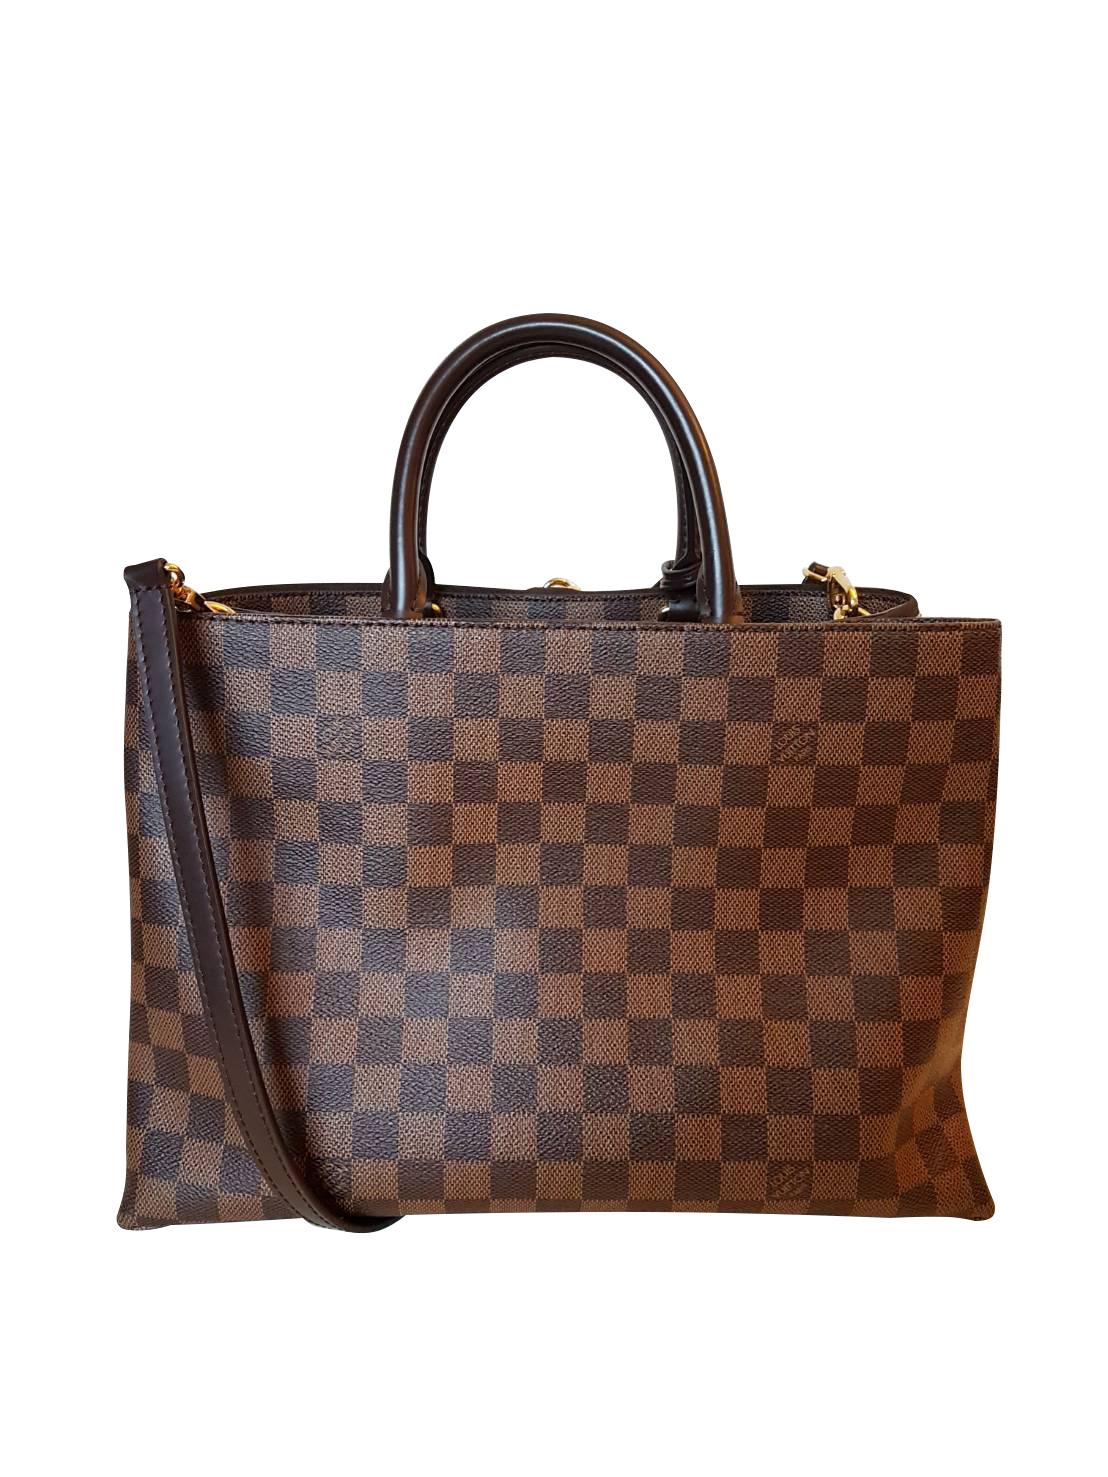 d2fdf09dba3 Louis Vuitton Brompton handbag | I Love Brand Names